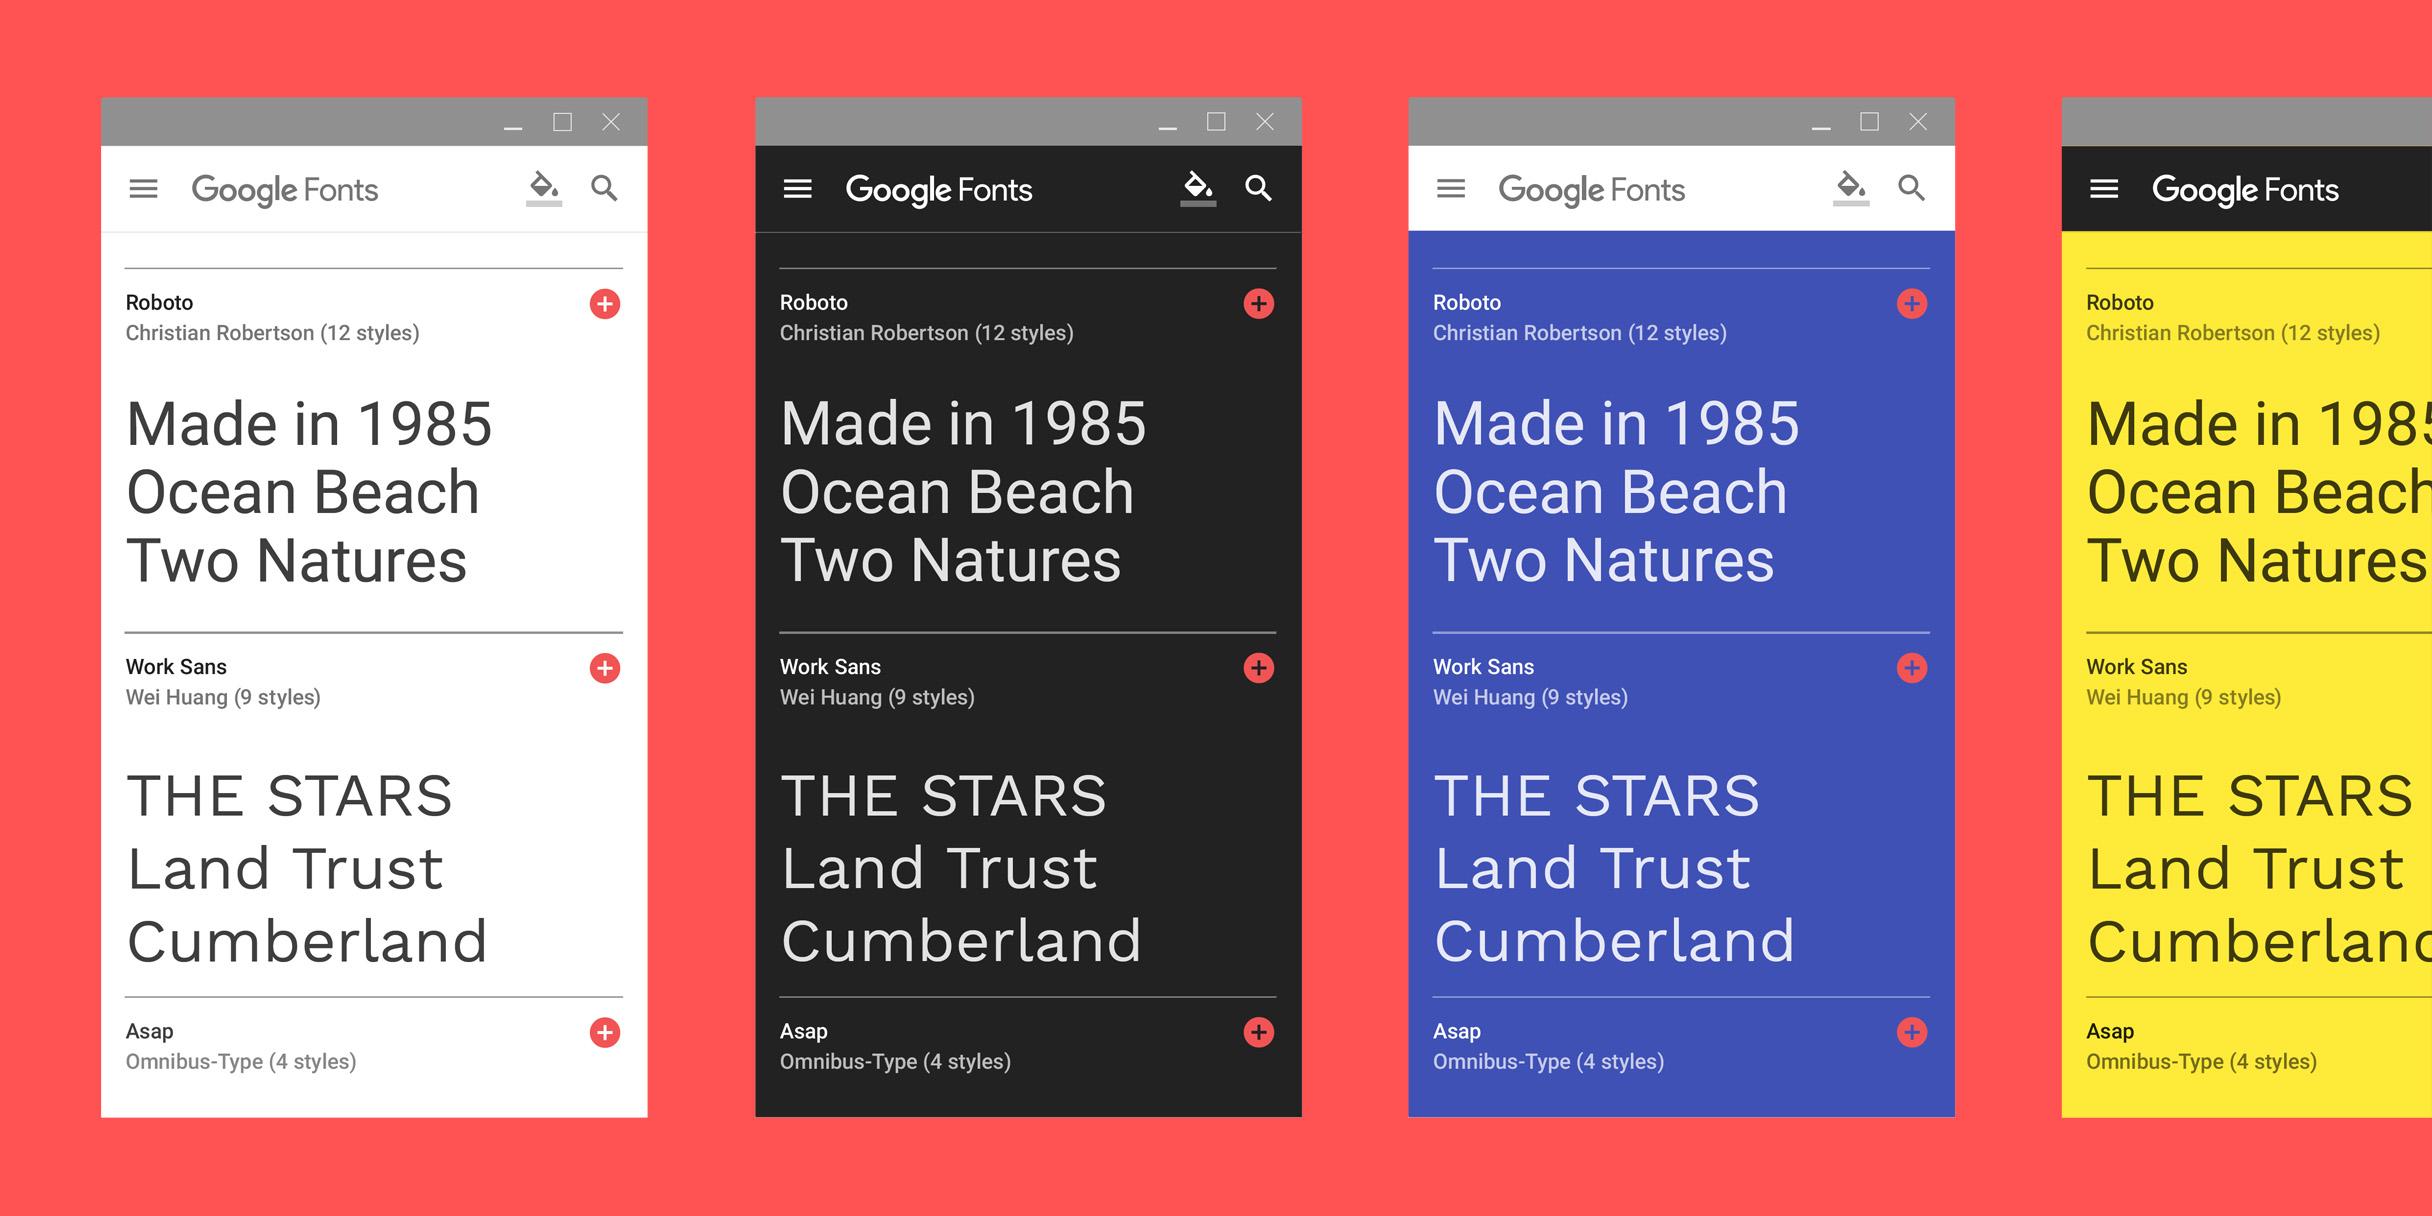 reimagining_google_fonts_2x1.jpg